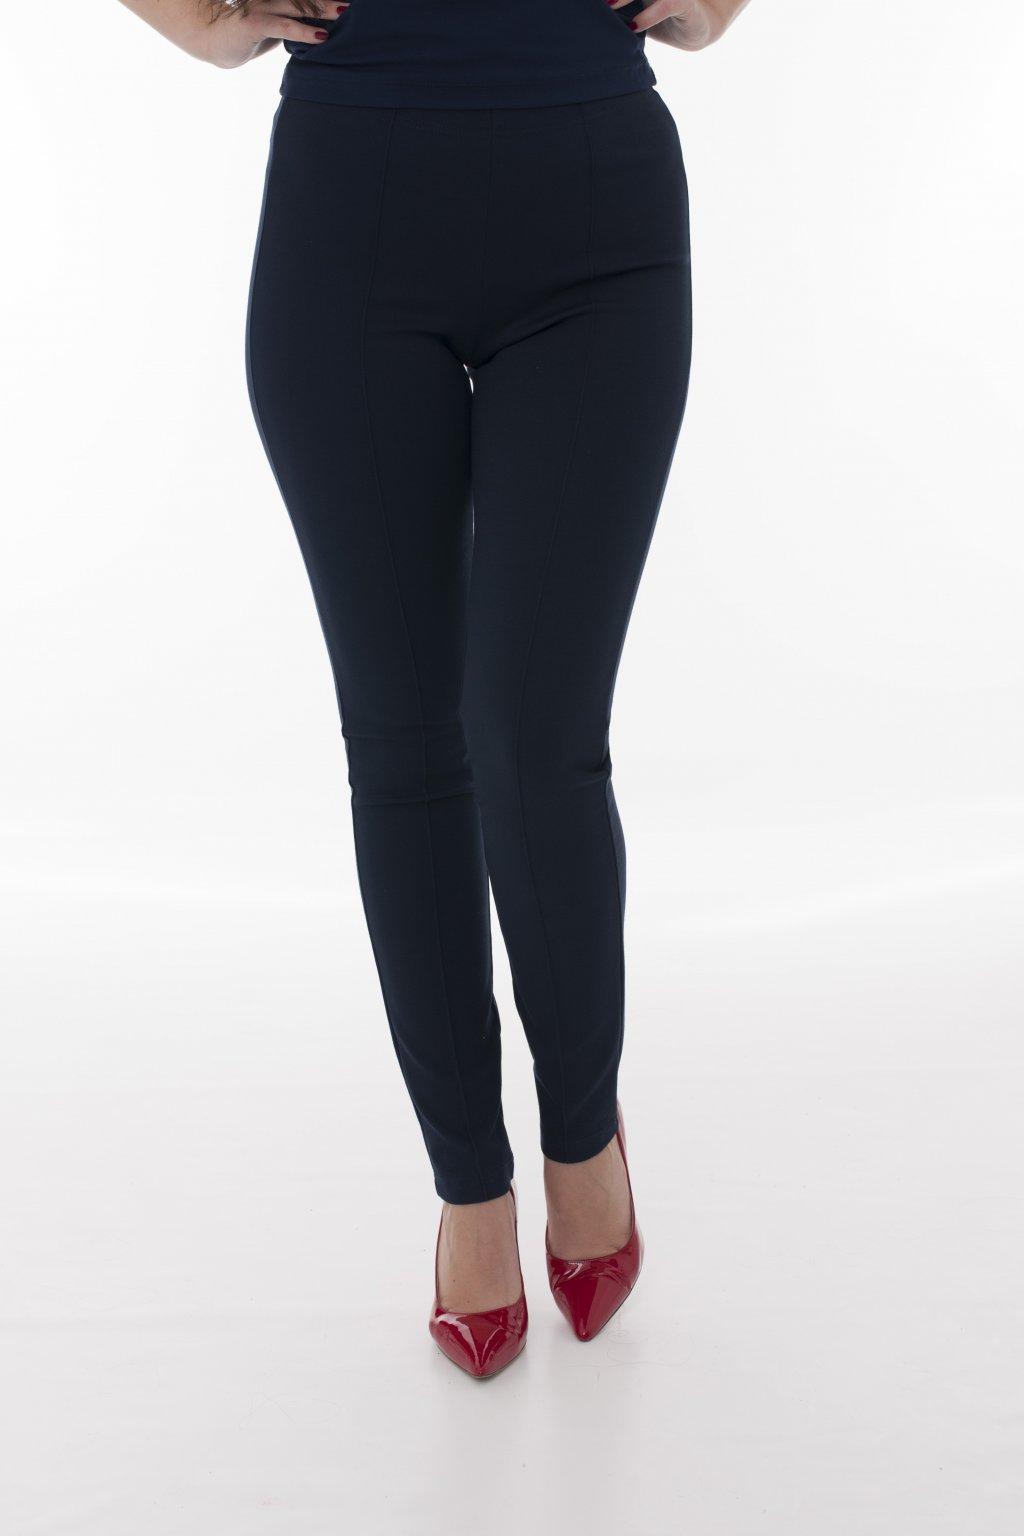 elastické-modré-nohavice-favab.sk.jpg